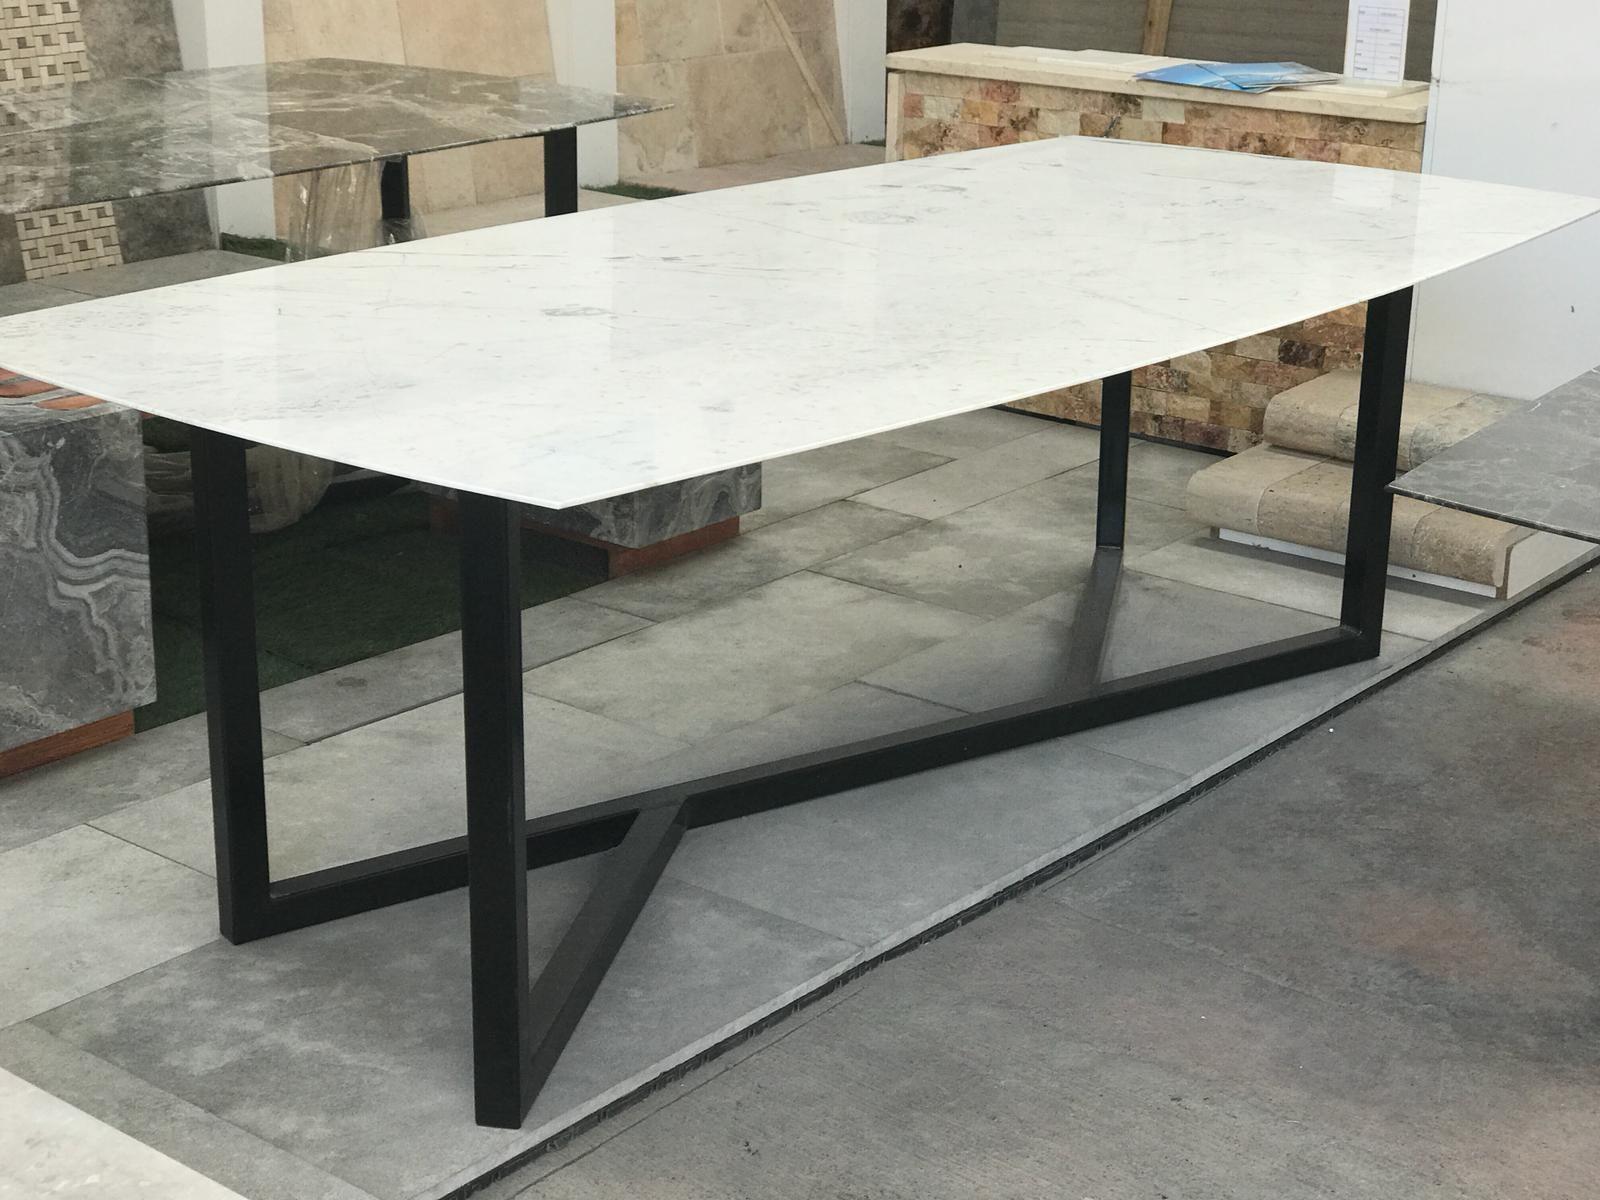 Beyaz Mermer Masa #beyazmermermasa Mermer Masa Çeşitleri ... concernant Table De Jardin Discount